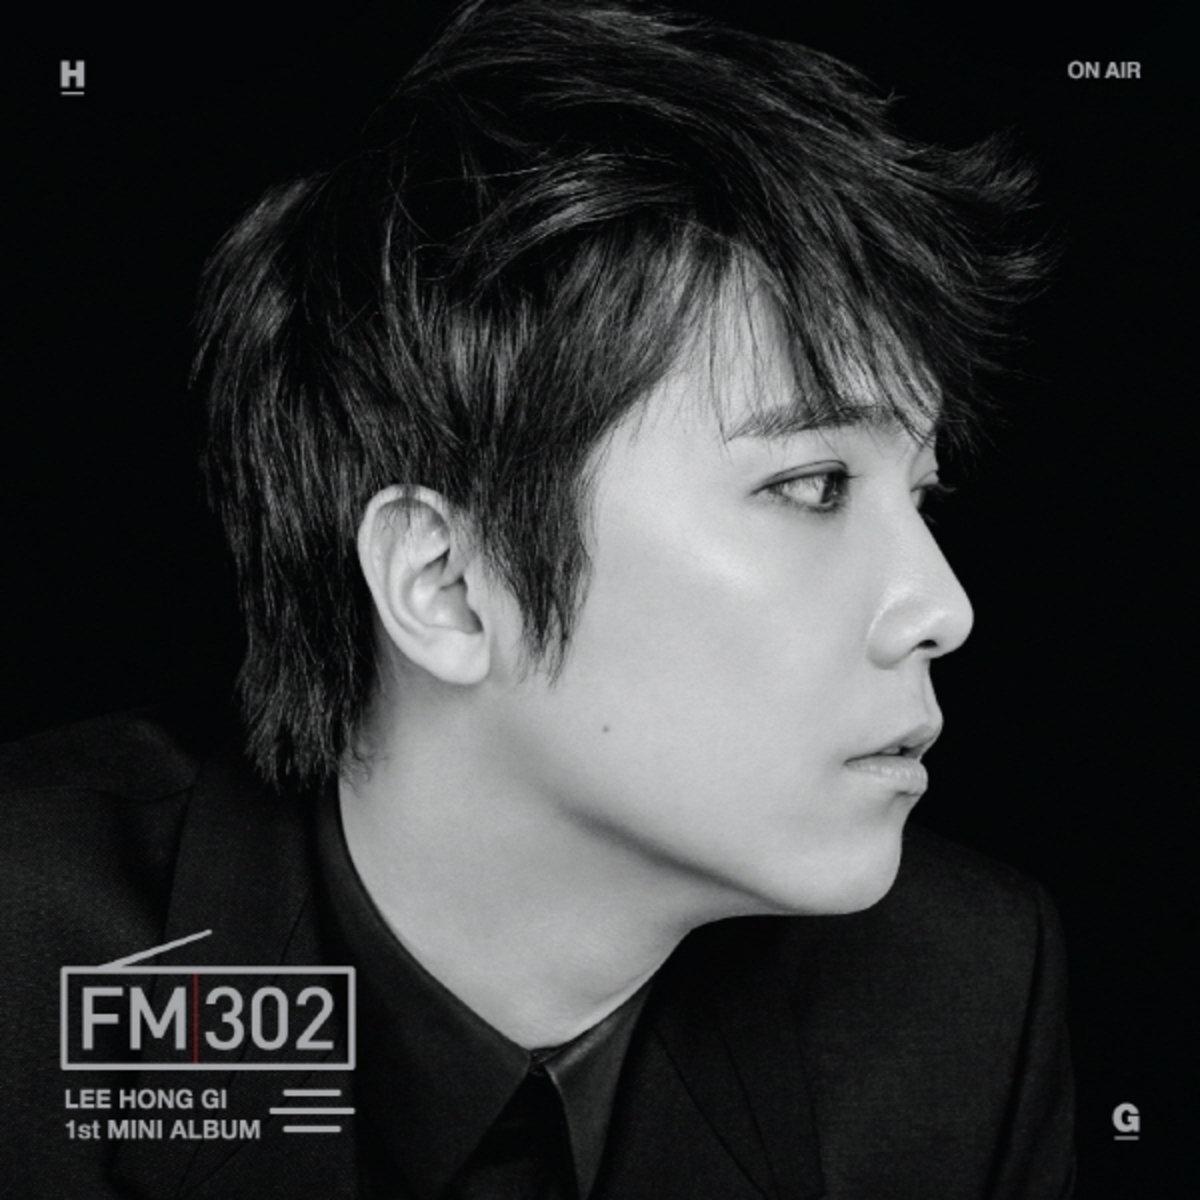 FTISLAND - Lee Hong Gi - Mini Album Vol.1 [FM 302] (Black Ver.)